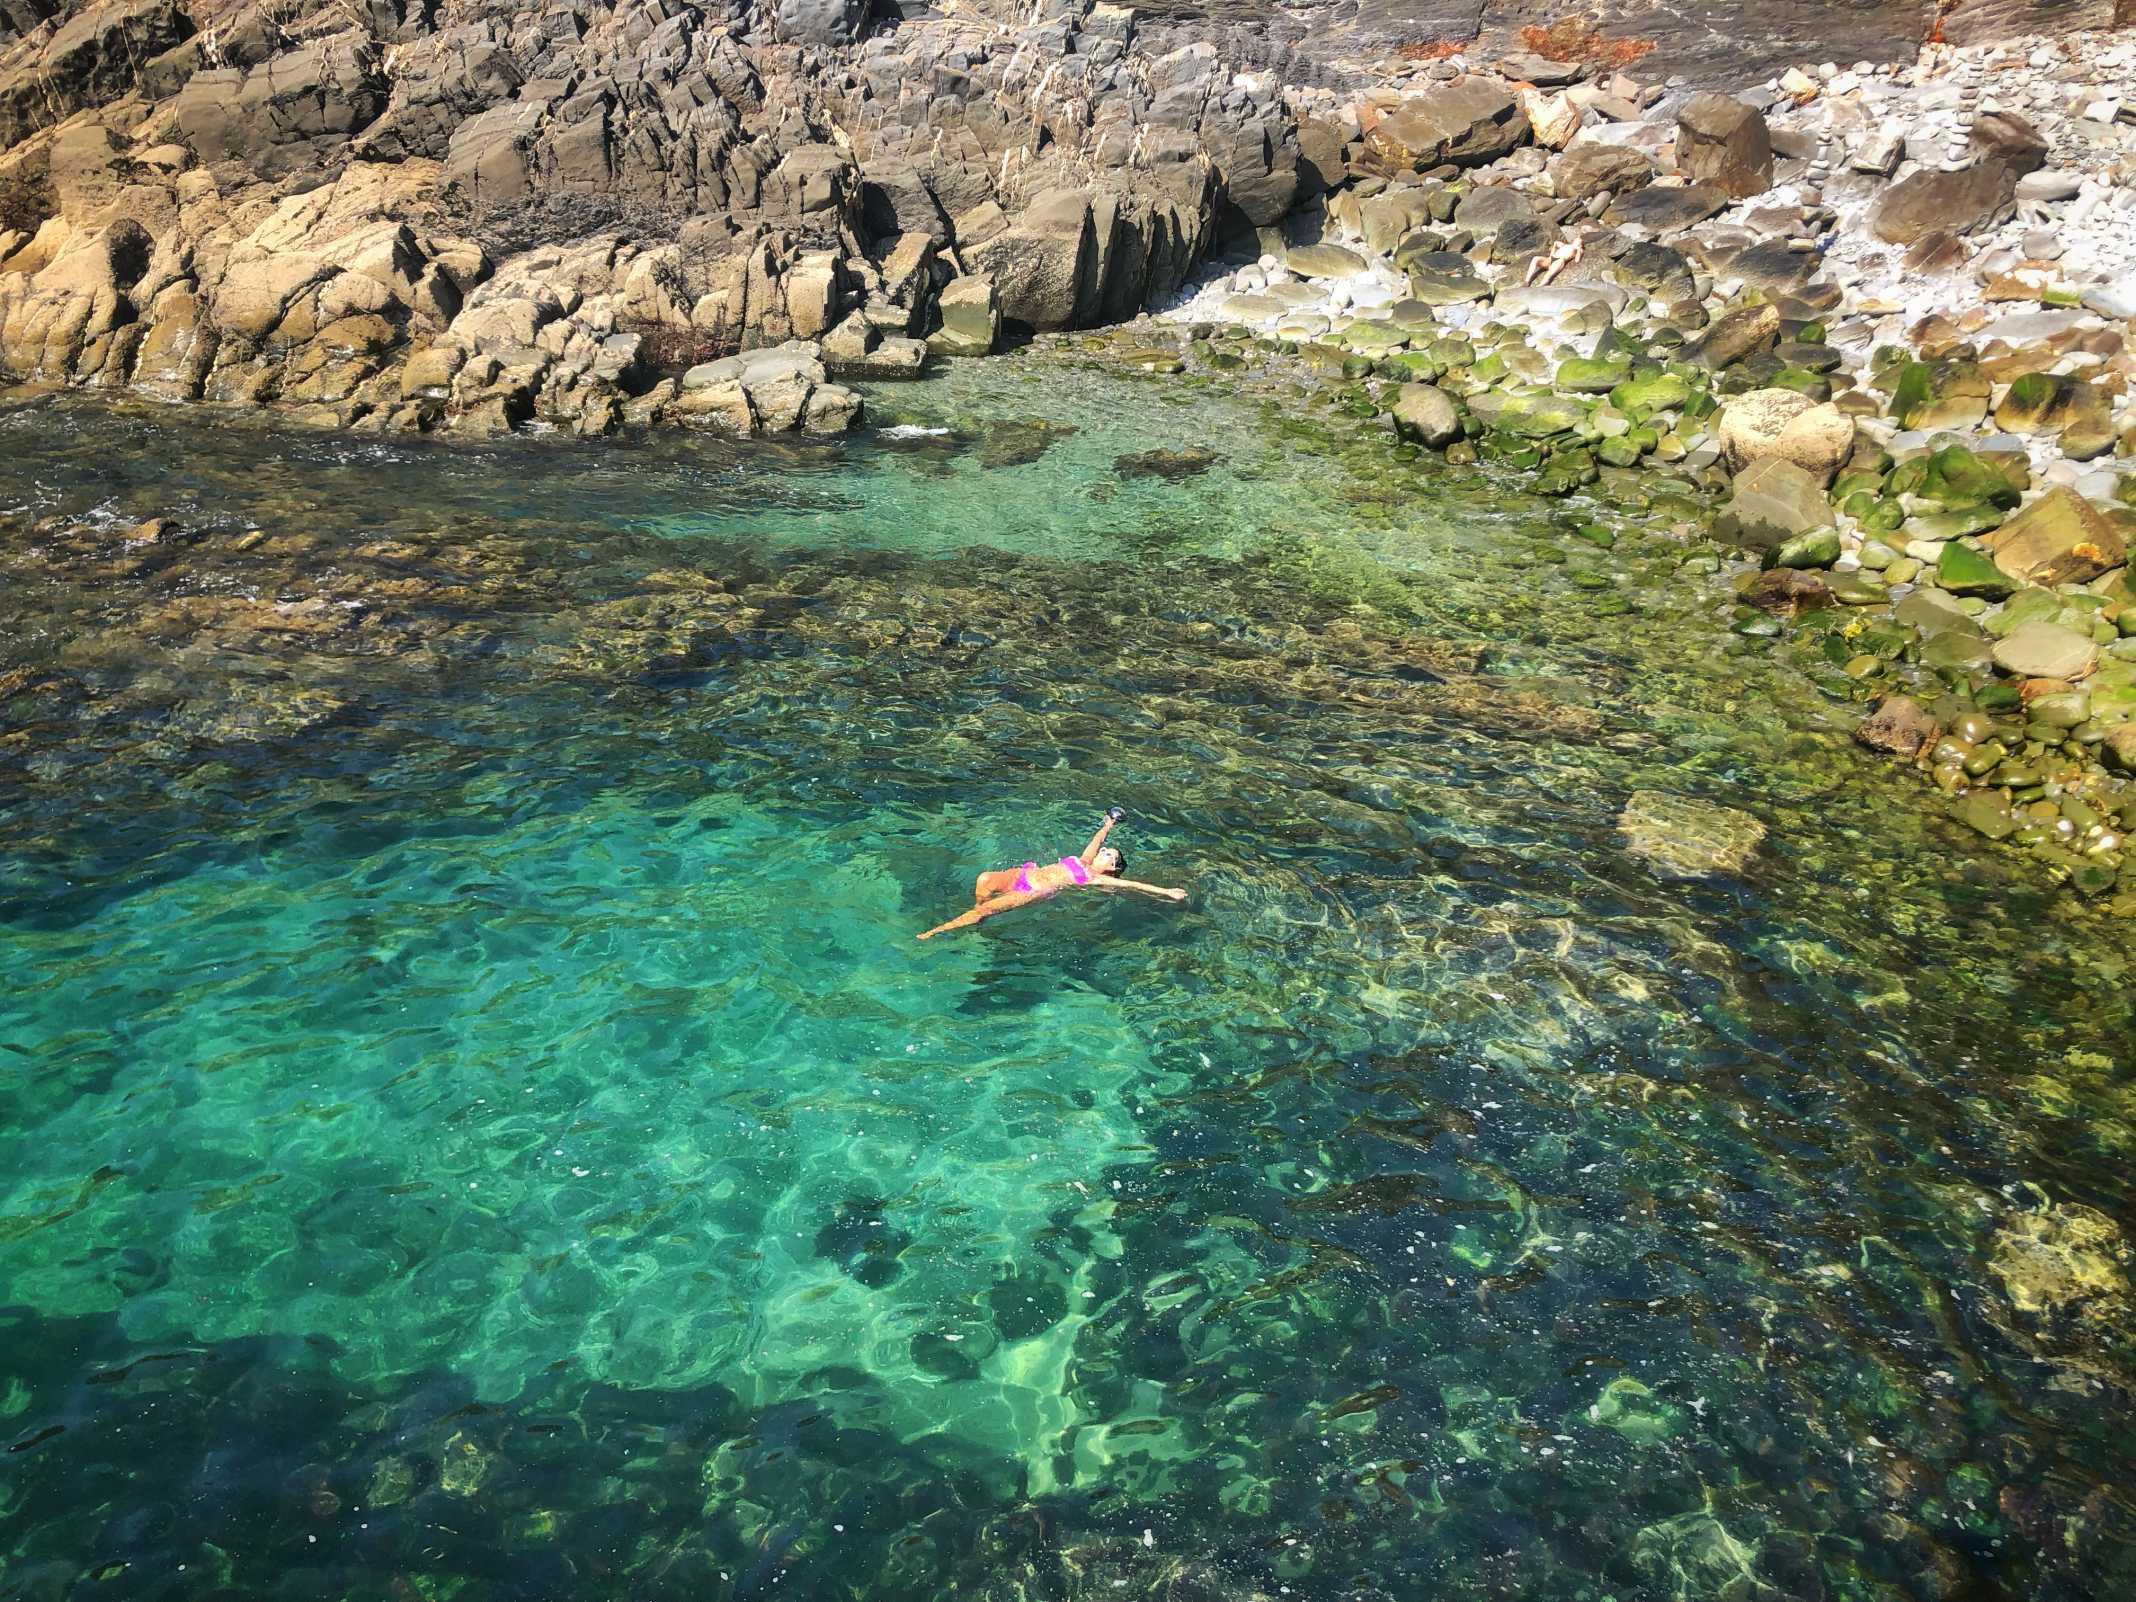 Zambujeira do Mar piscina natural